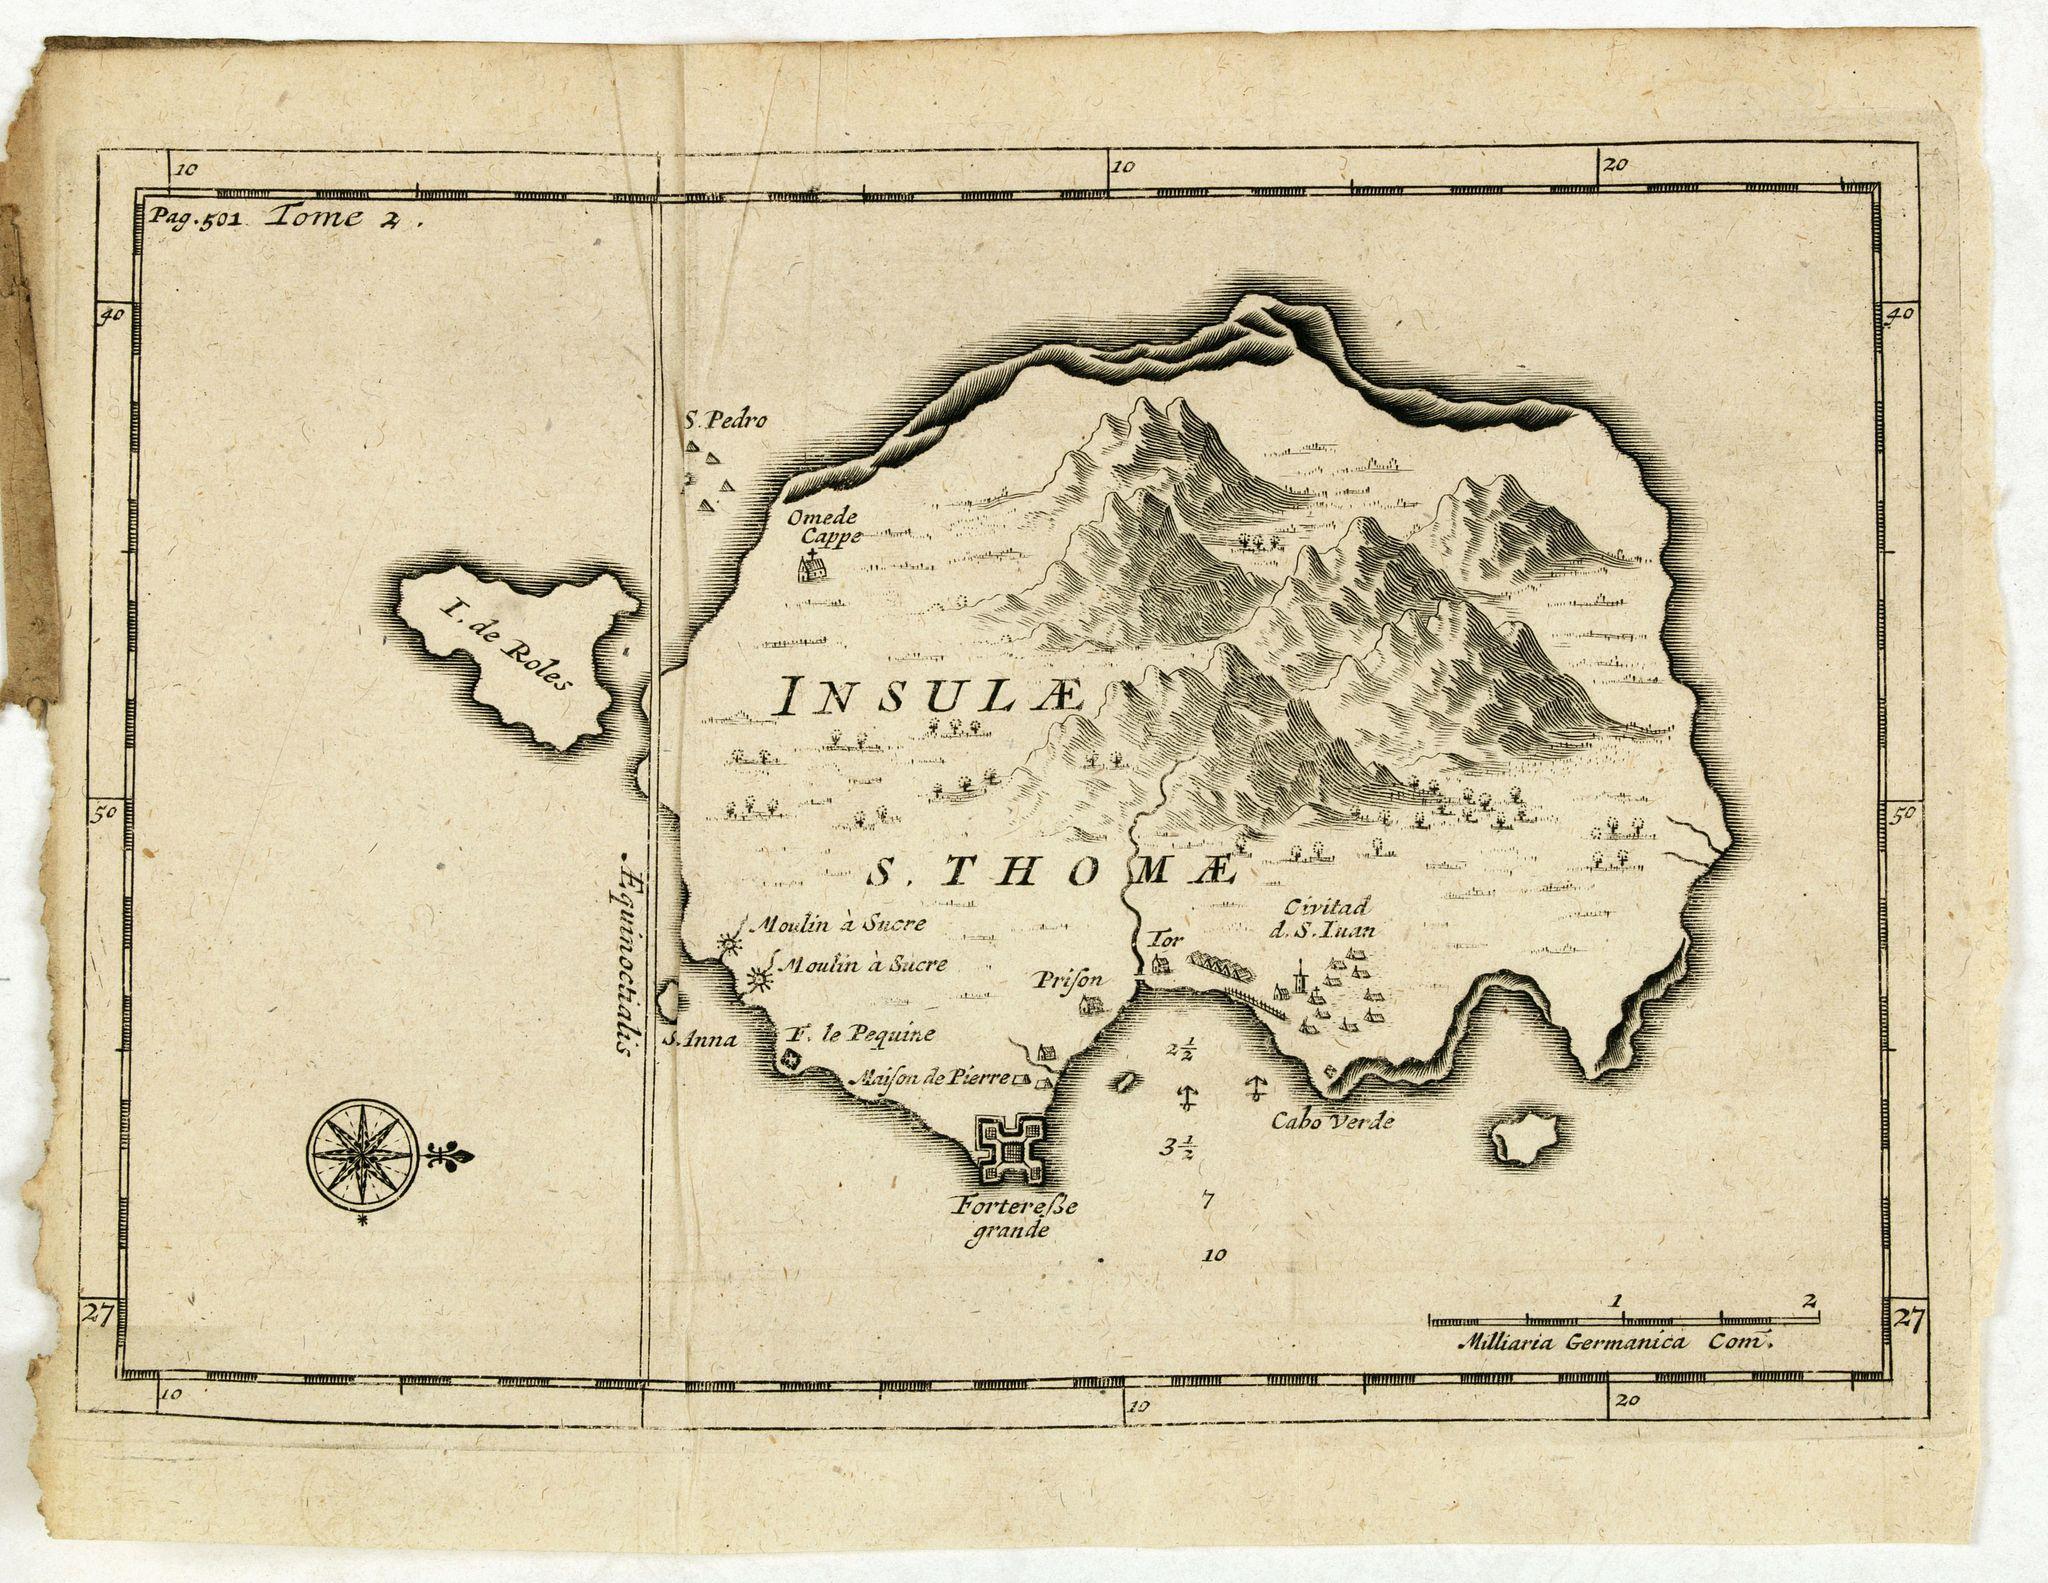 DE RENNEVILLE, R.A.C. -  Insulae S. Thomae.